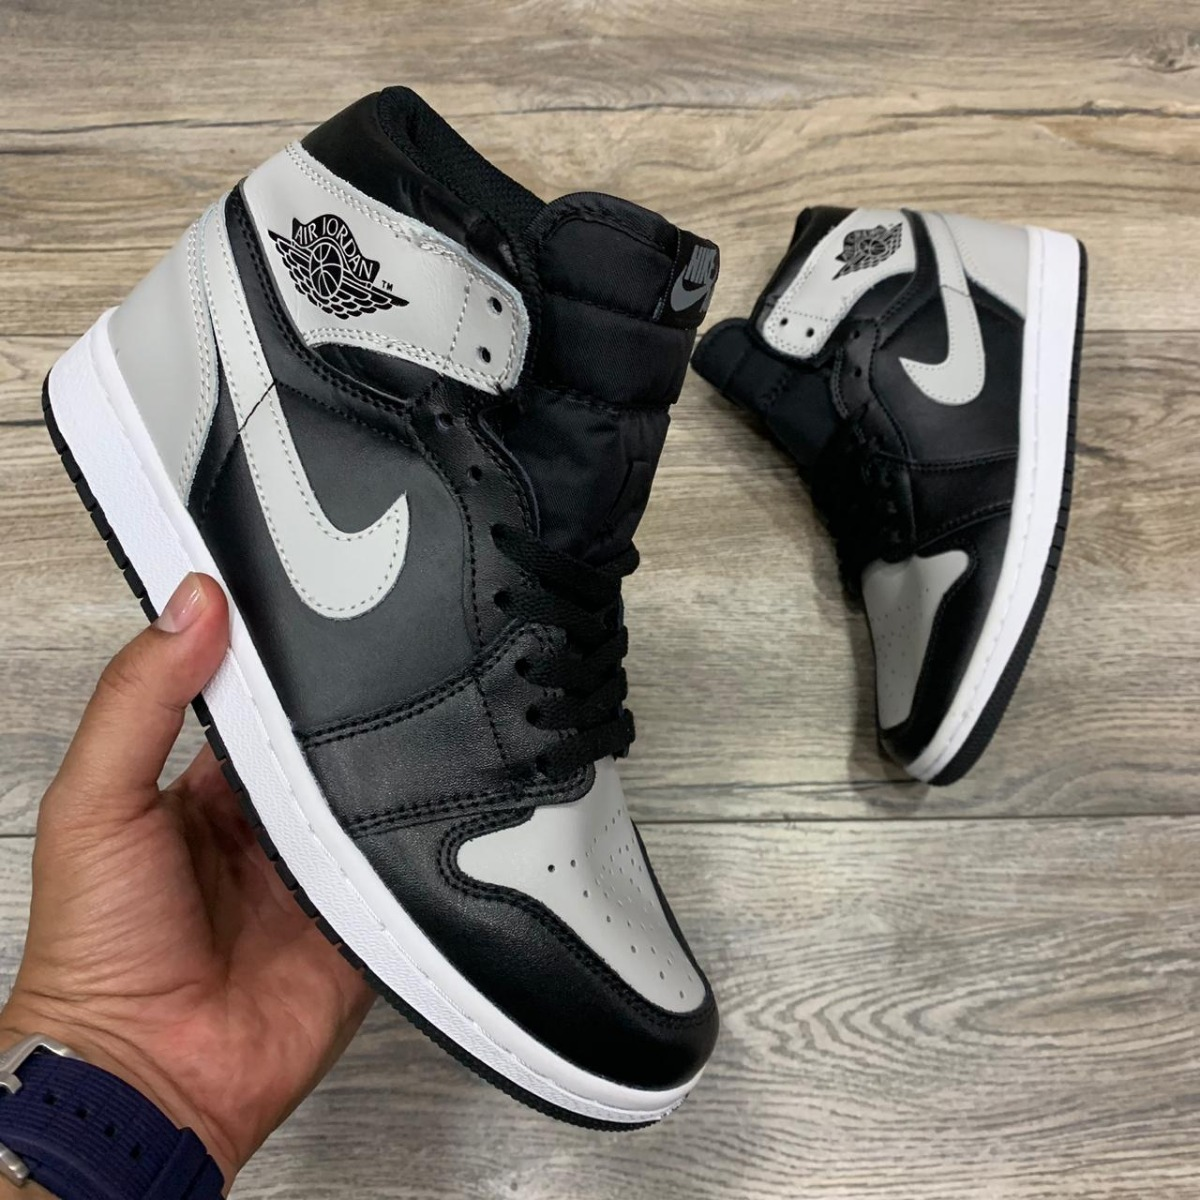 Zapatillas Tenis Nike Air Jordan 1 Mid Hombre Original